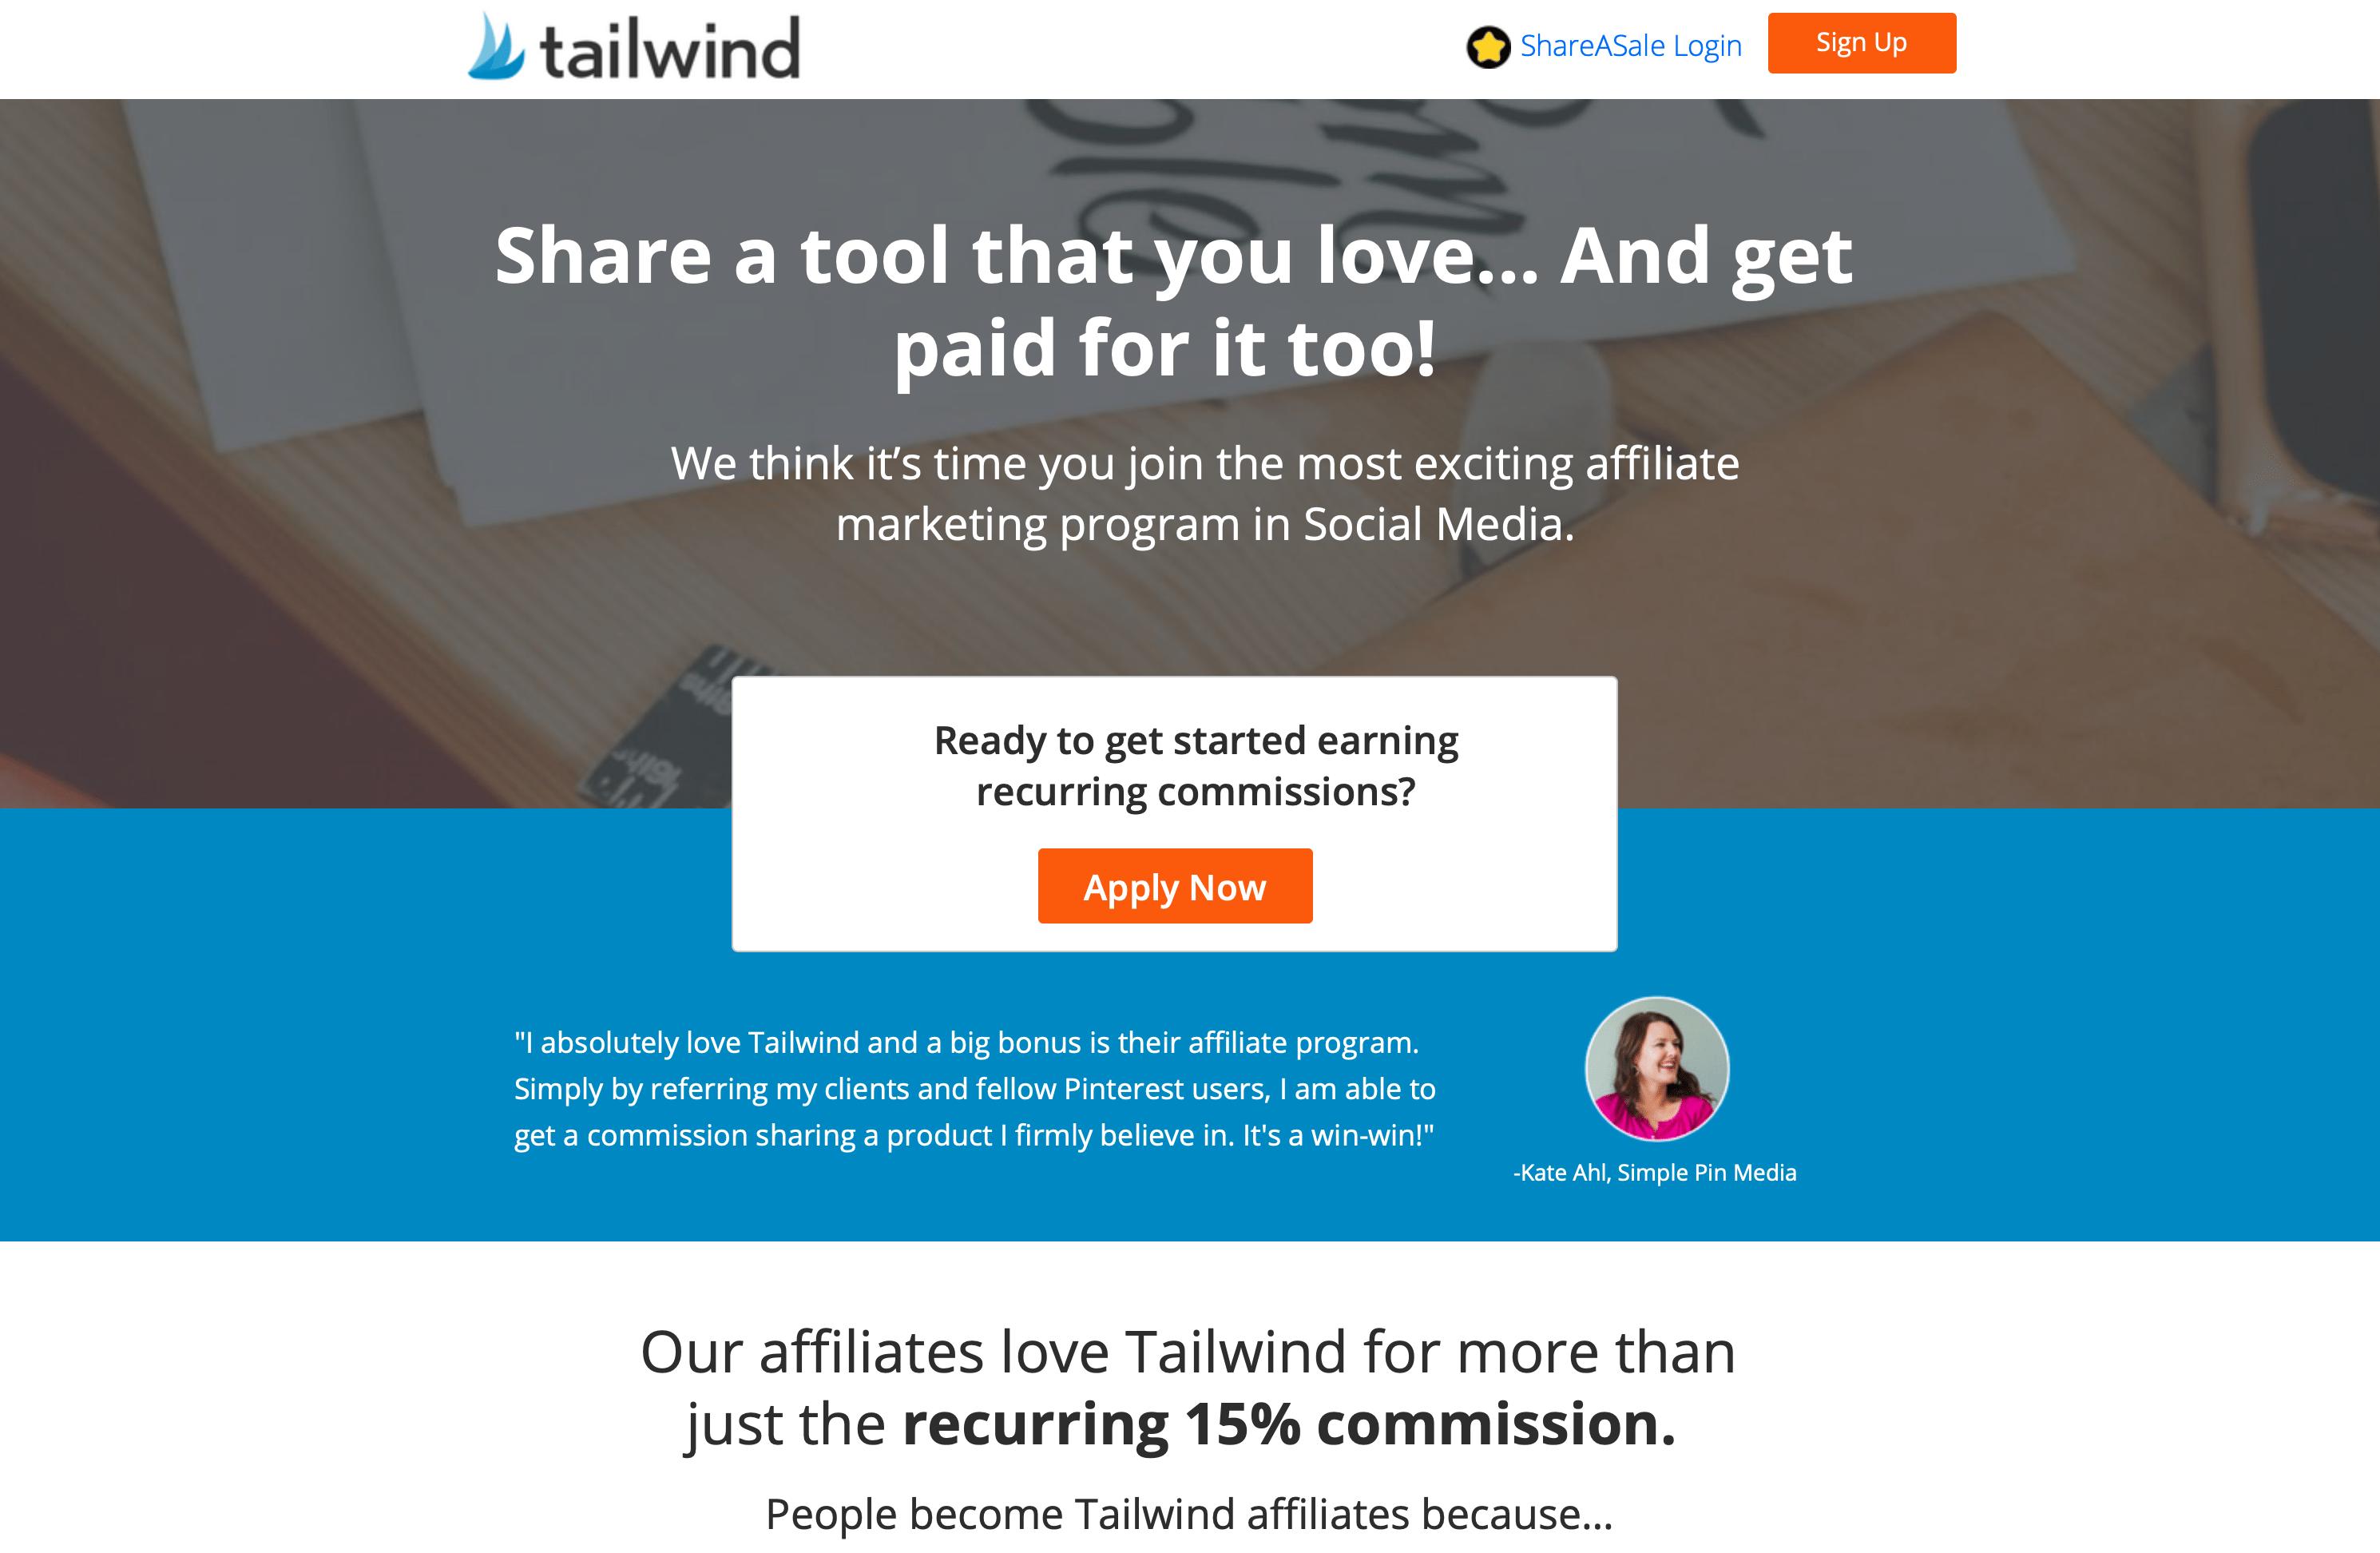 tailwind-affiliate-program